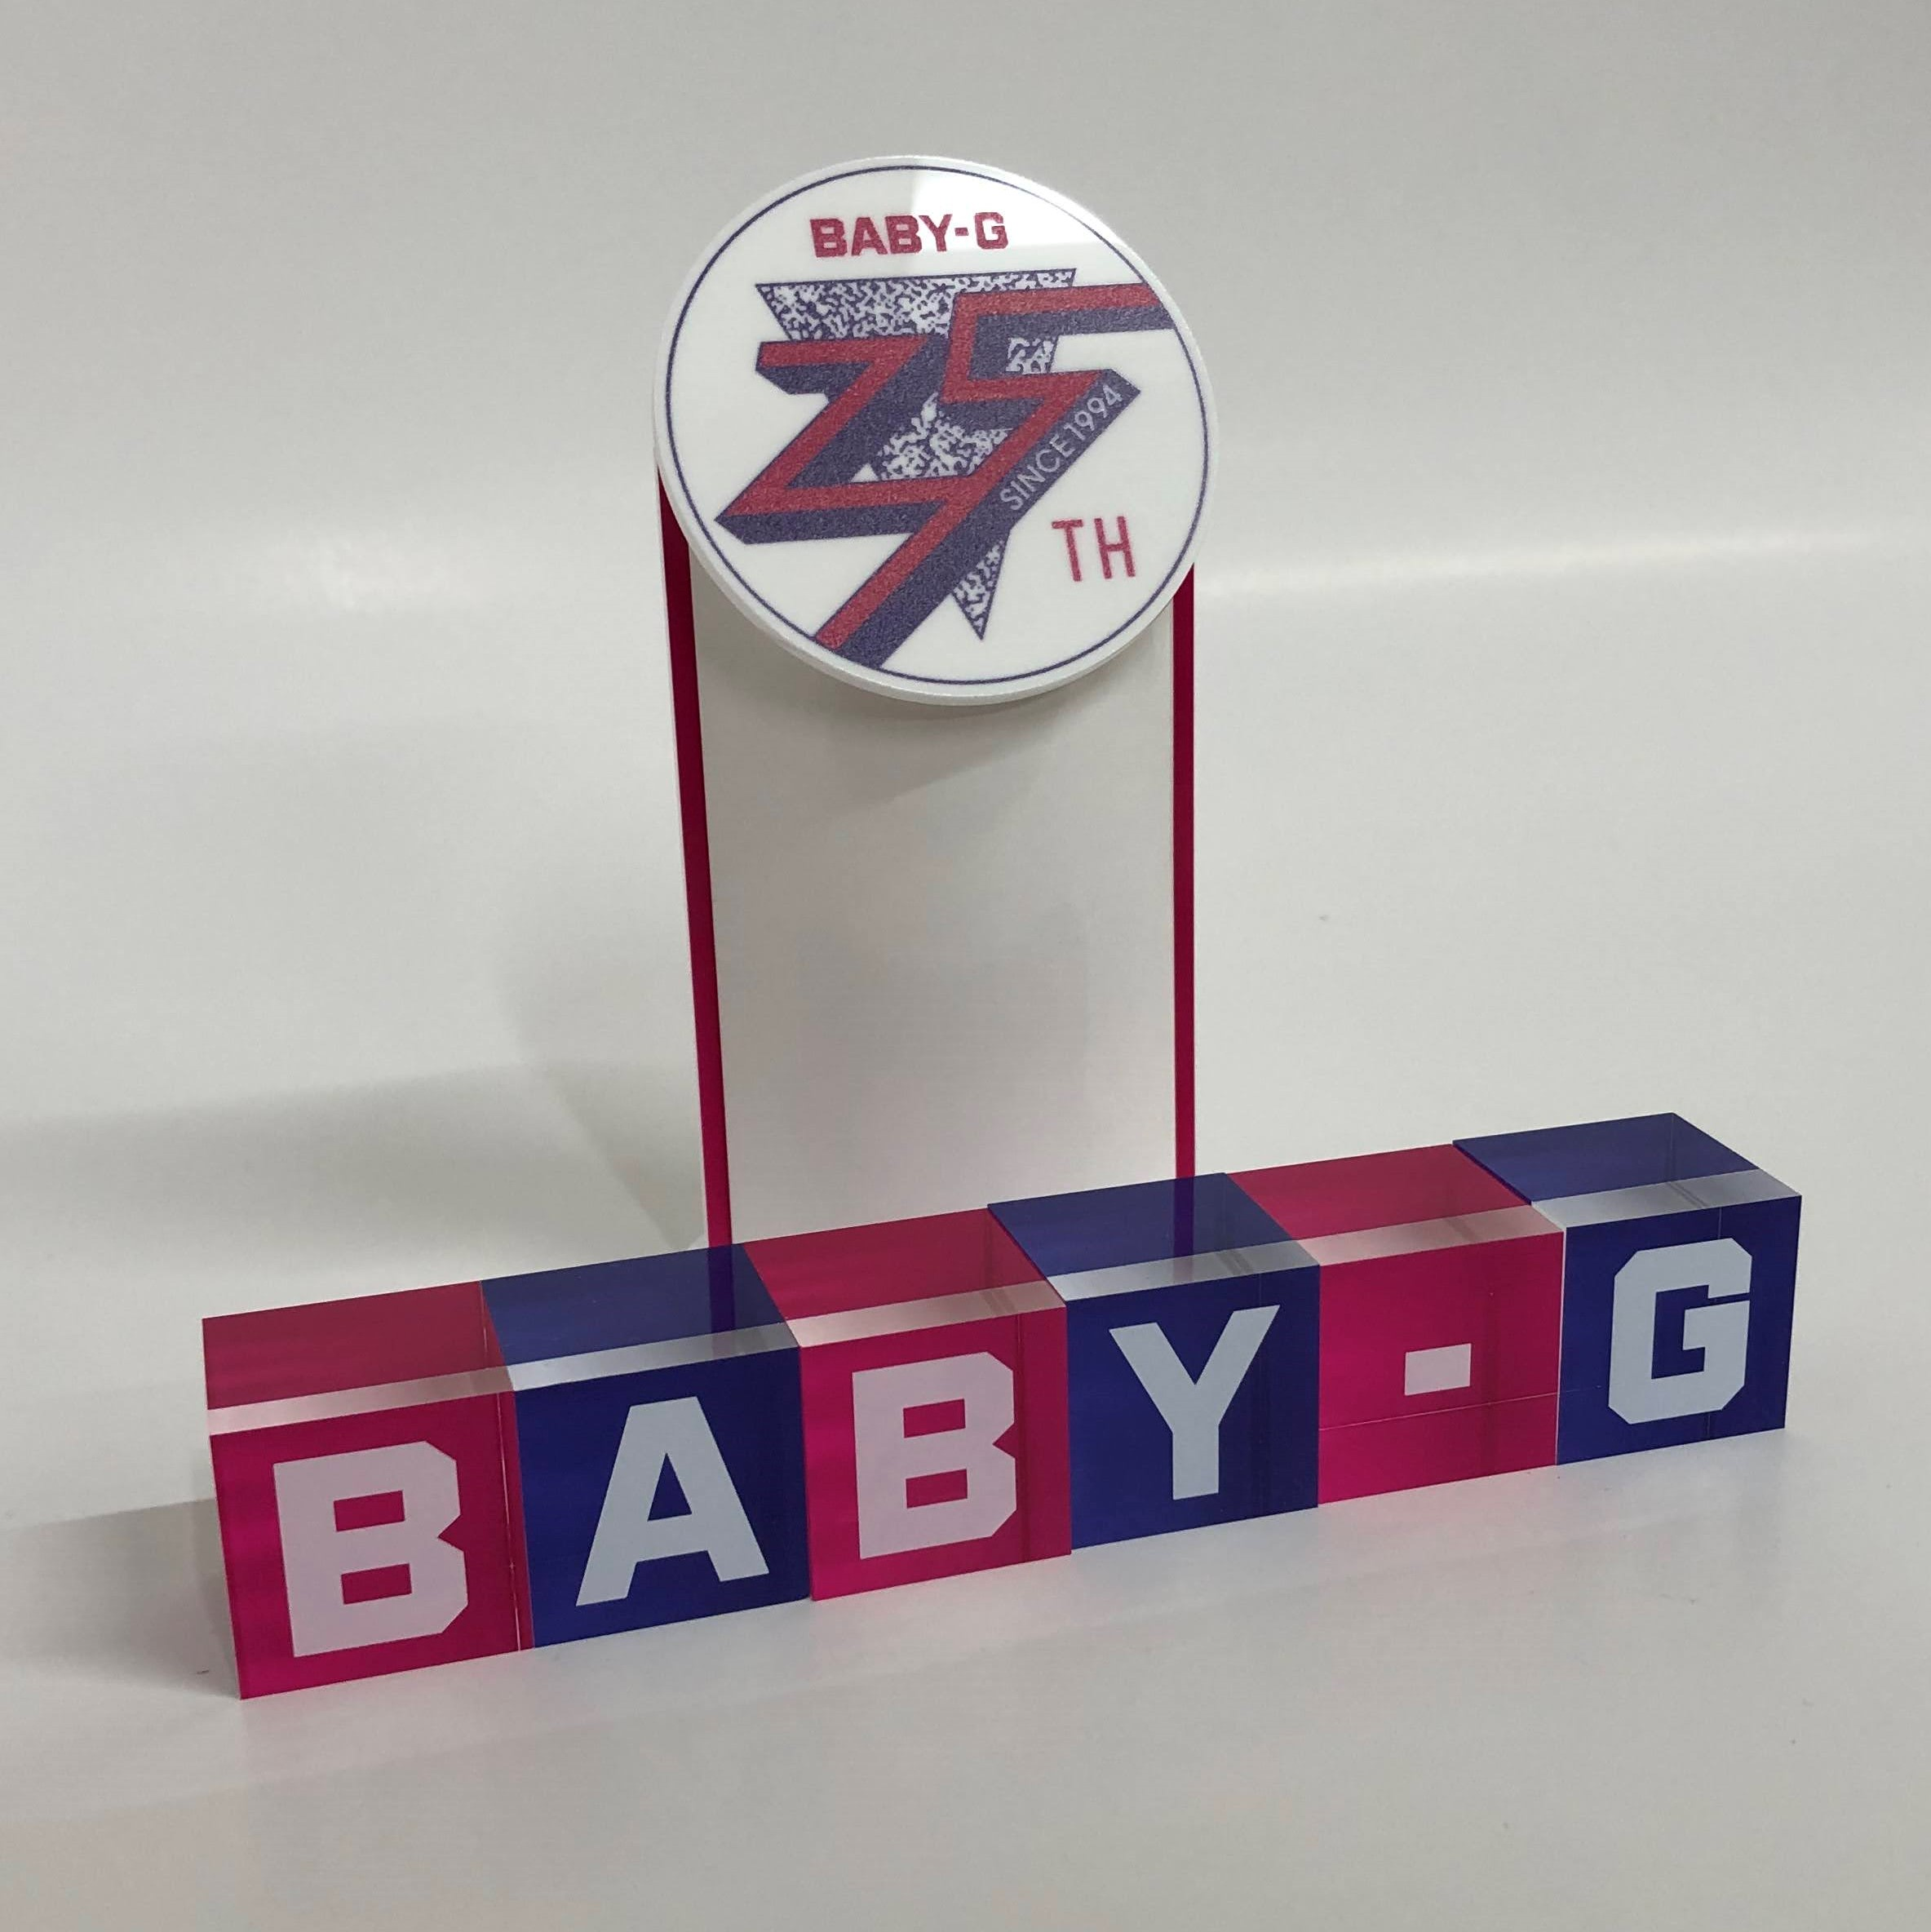 BABY-G 25thツール (3)